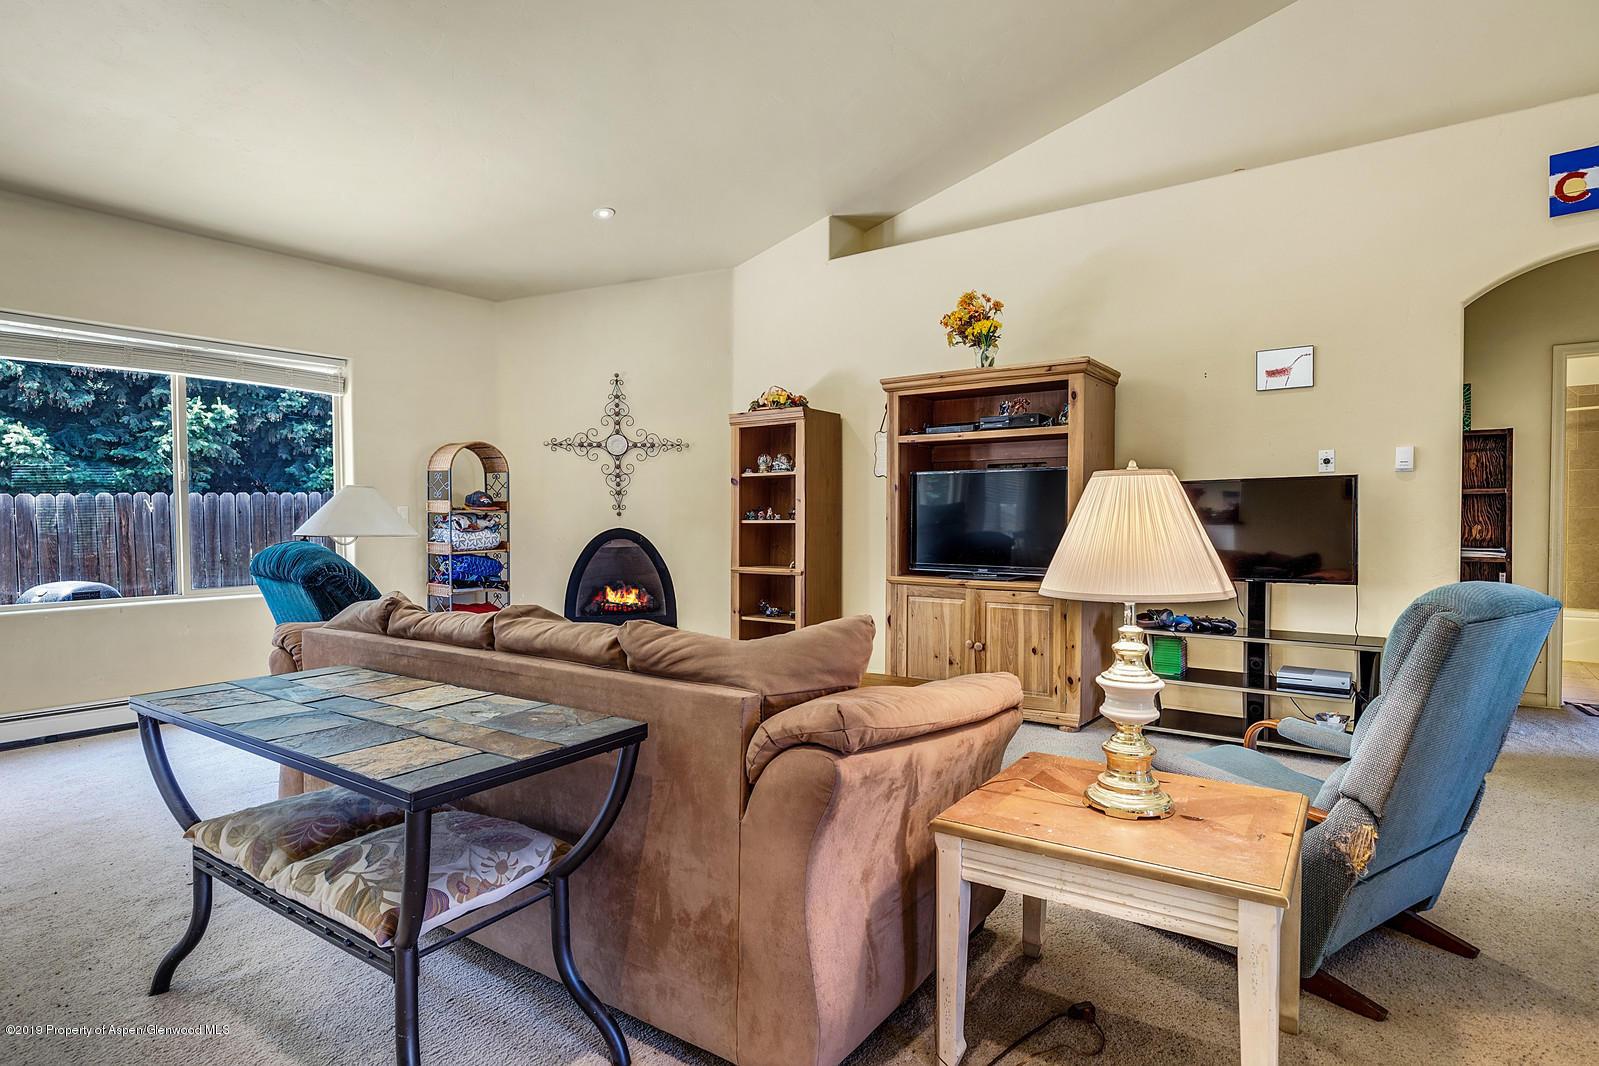 MLS# 159733 - 4 - 78 Willow Creek Trail, Battlement Mesa, CO 81635